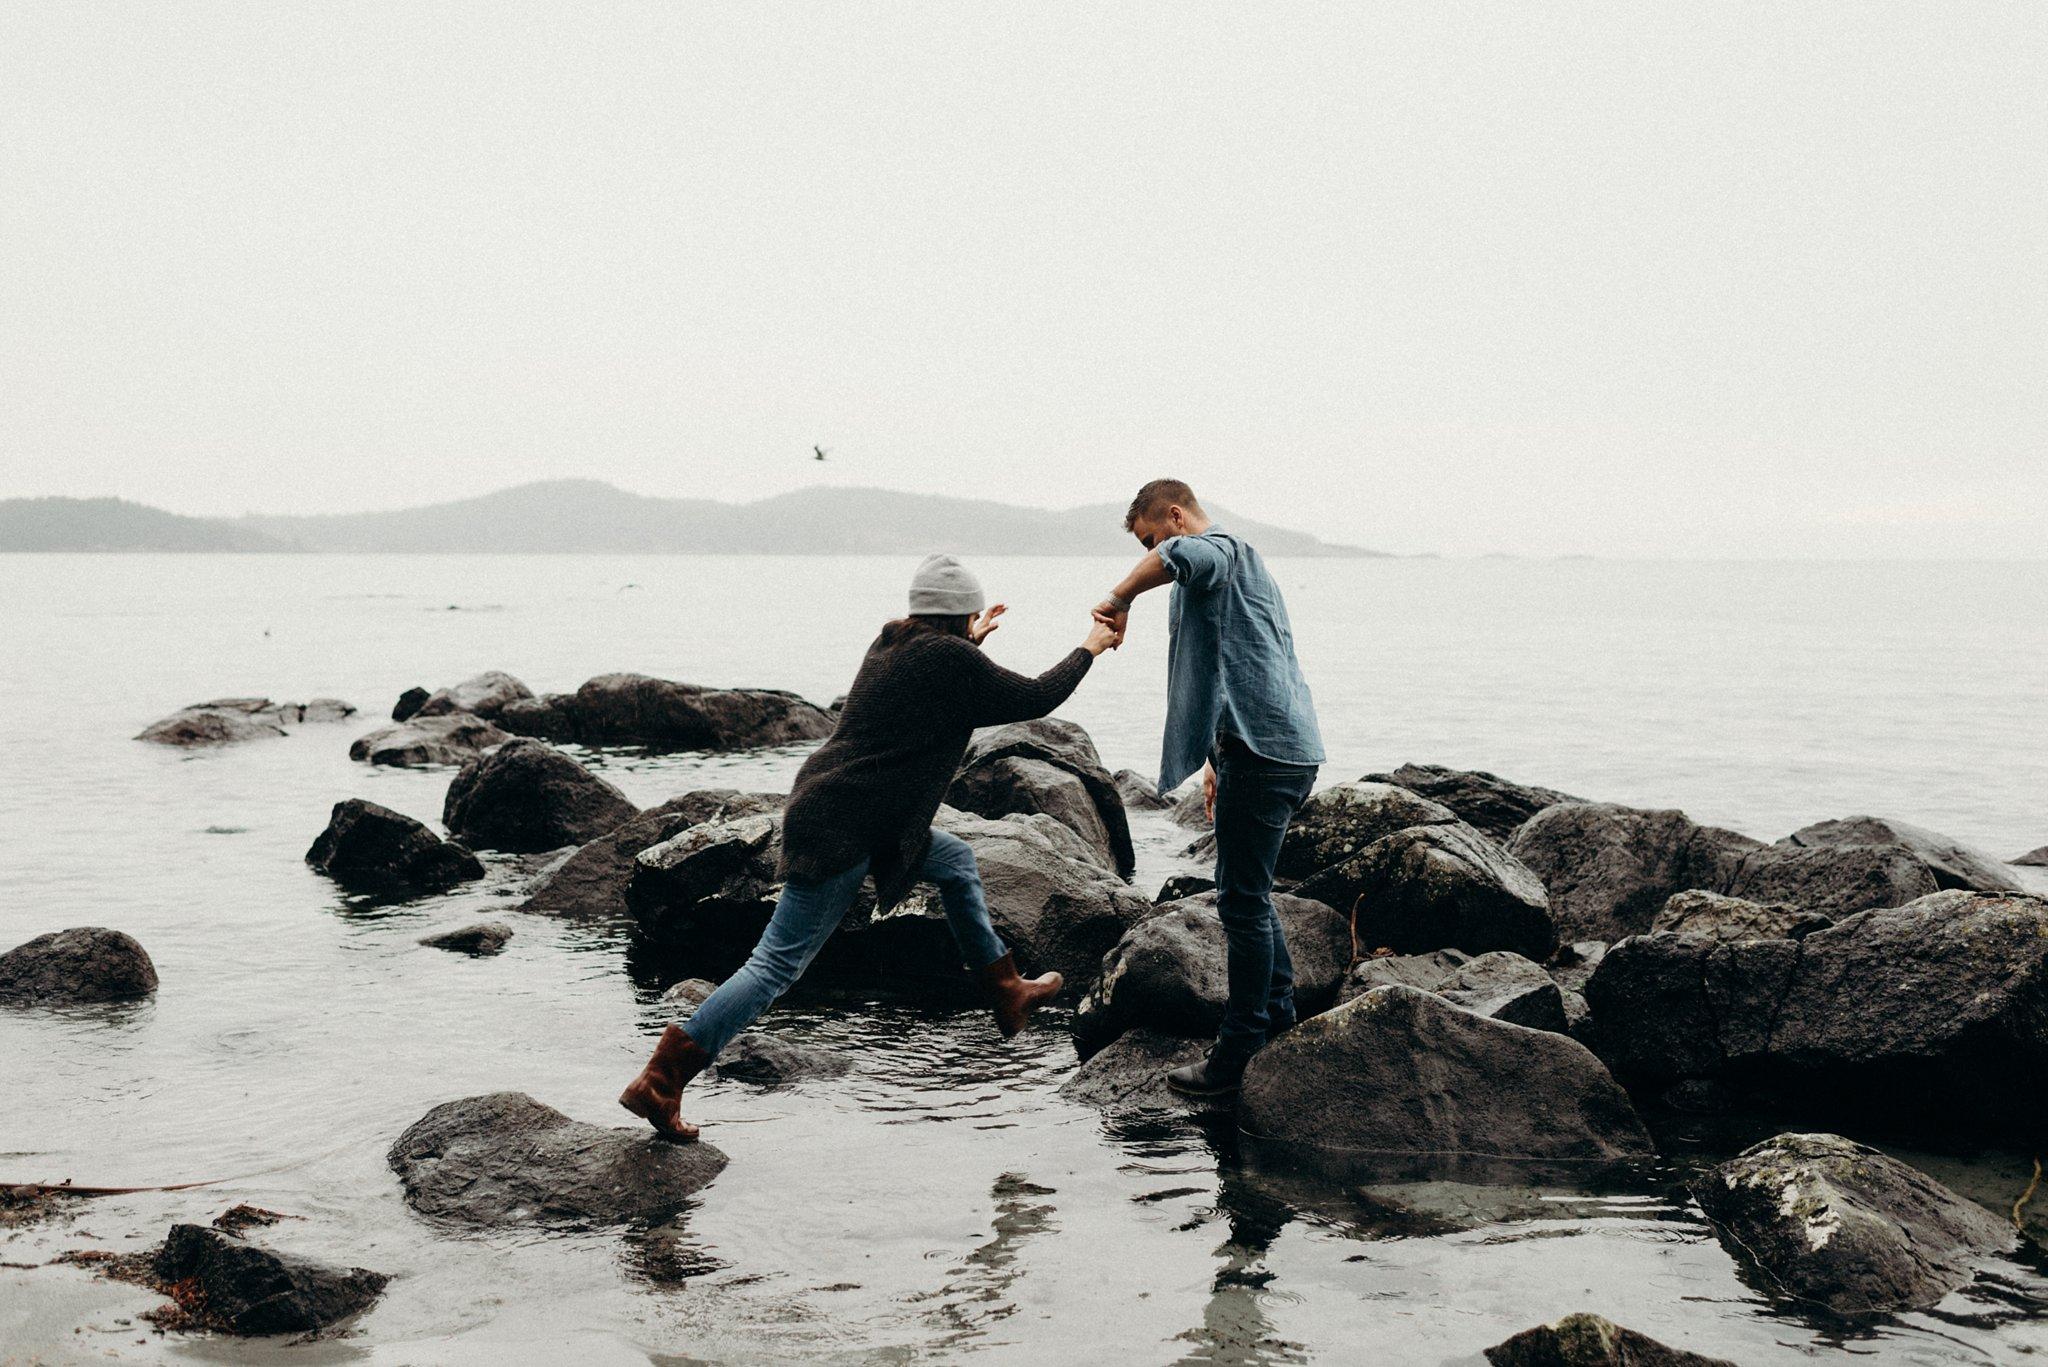 kaihla_tonai_intimate_wedding_elopement_photographer_7097.jpg